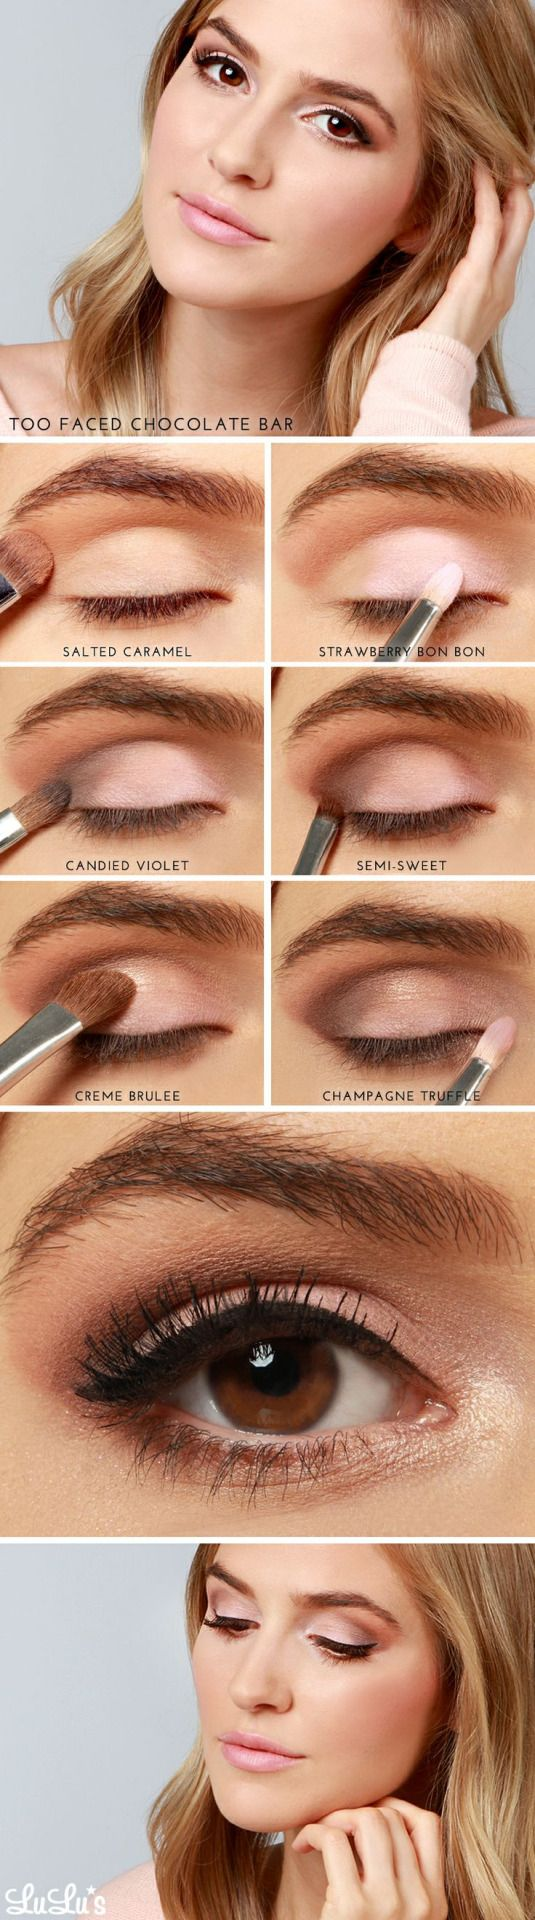 Eye Tutorial Using Too Faced Chocolate Bar Pallette | beauty | Pinterest | Makeup, Eye Makeup and Eyeshadow